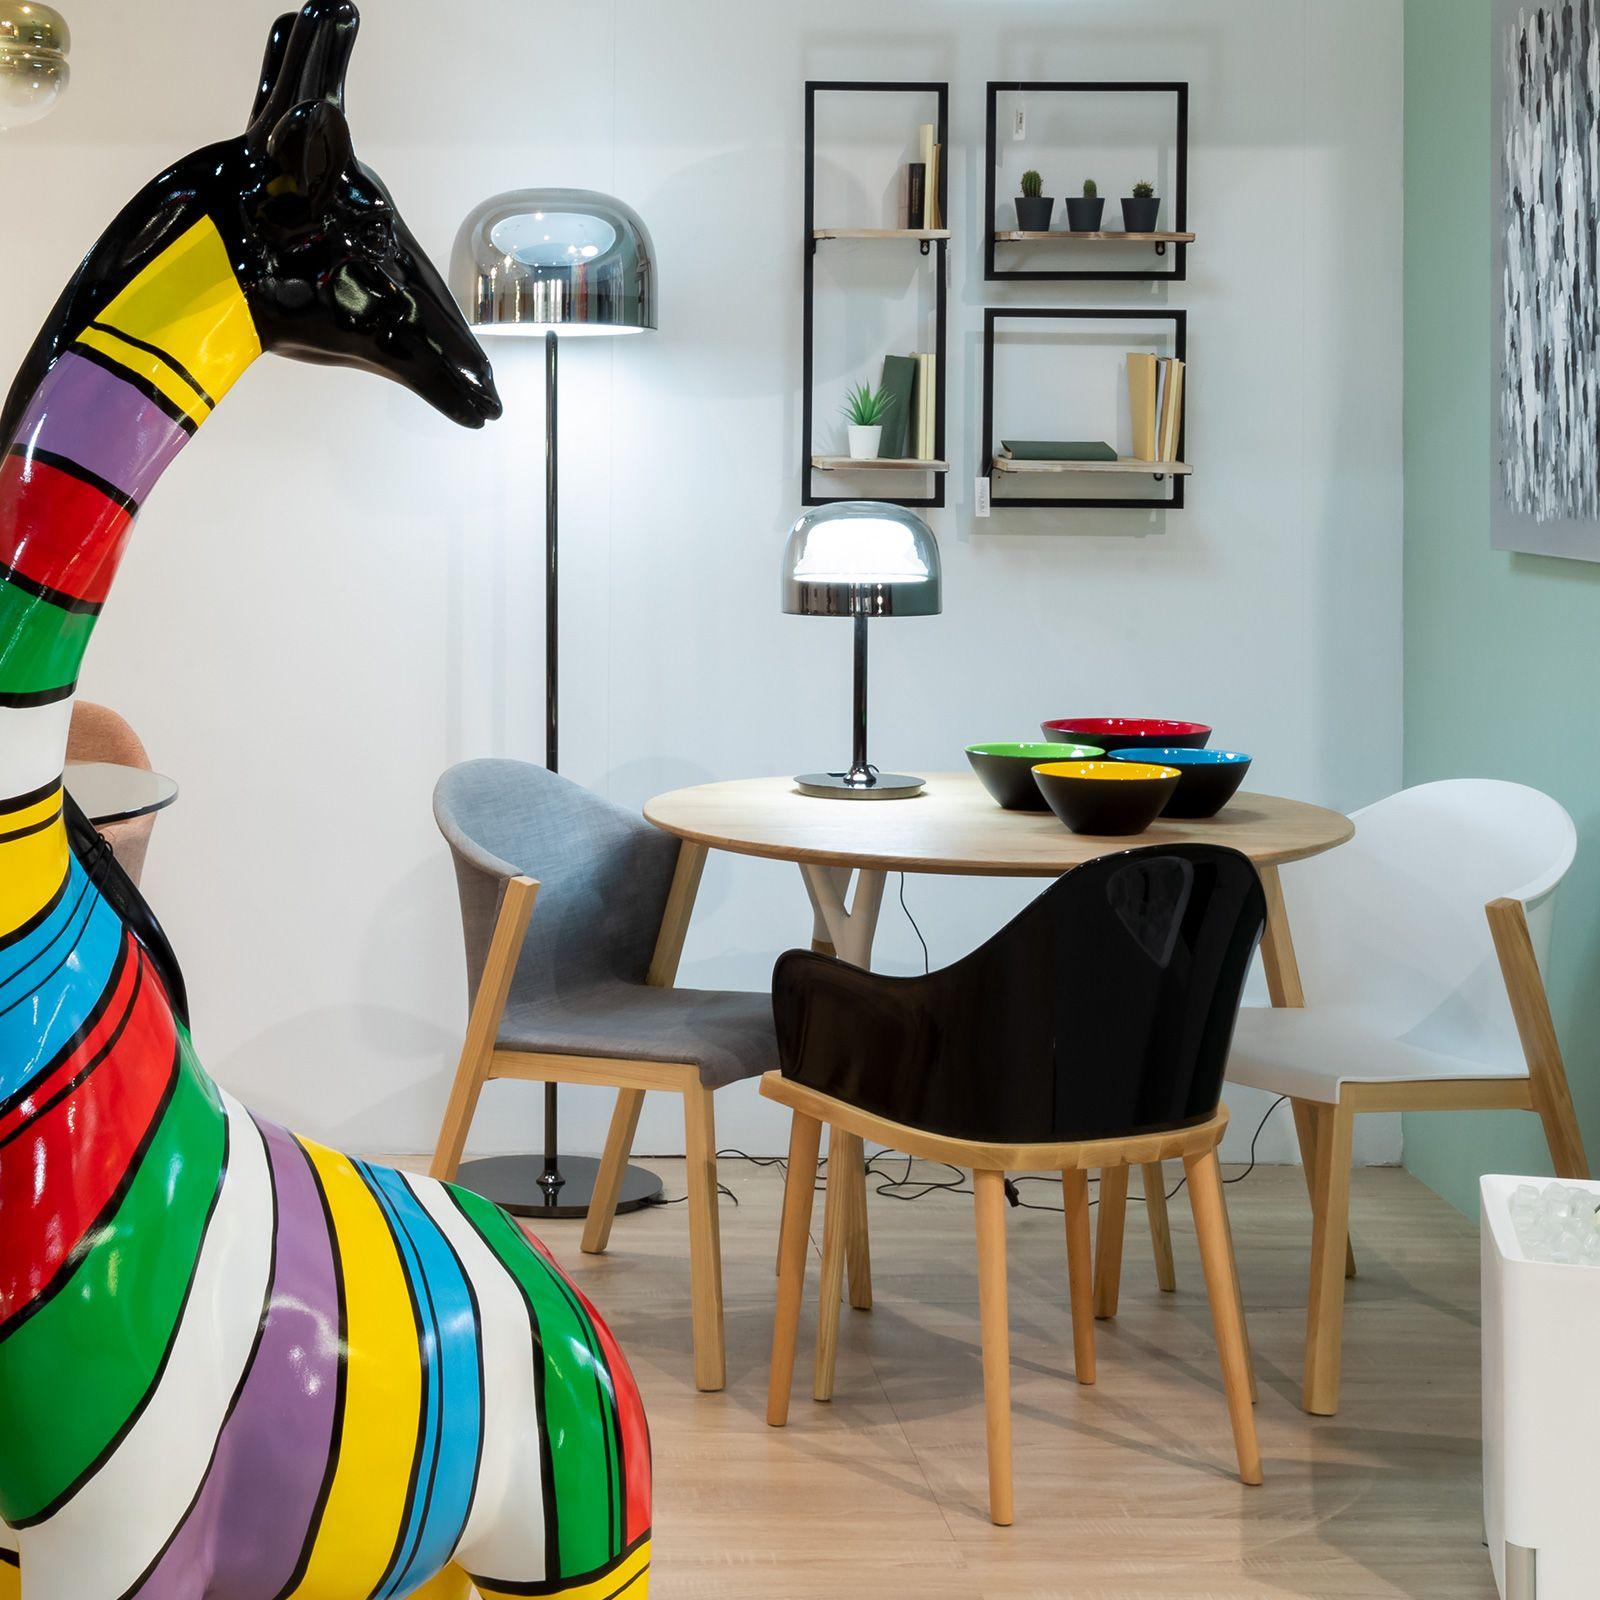 BEKSAND Black | Silla con brazos. Madera de fresno y policarbonato negro (57 x 54 x 82 cm)